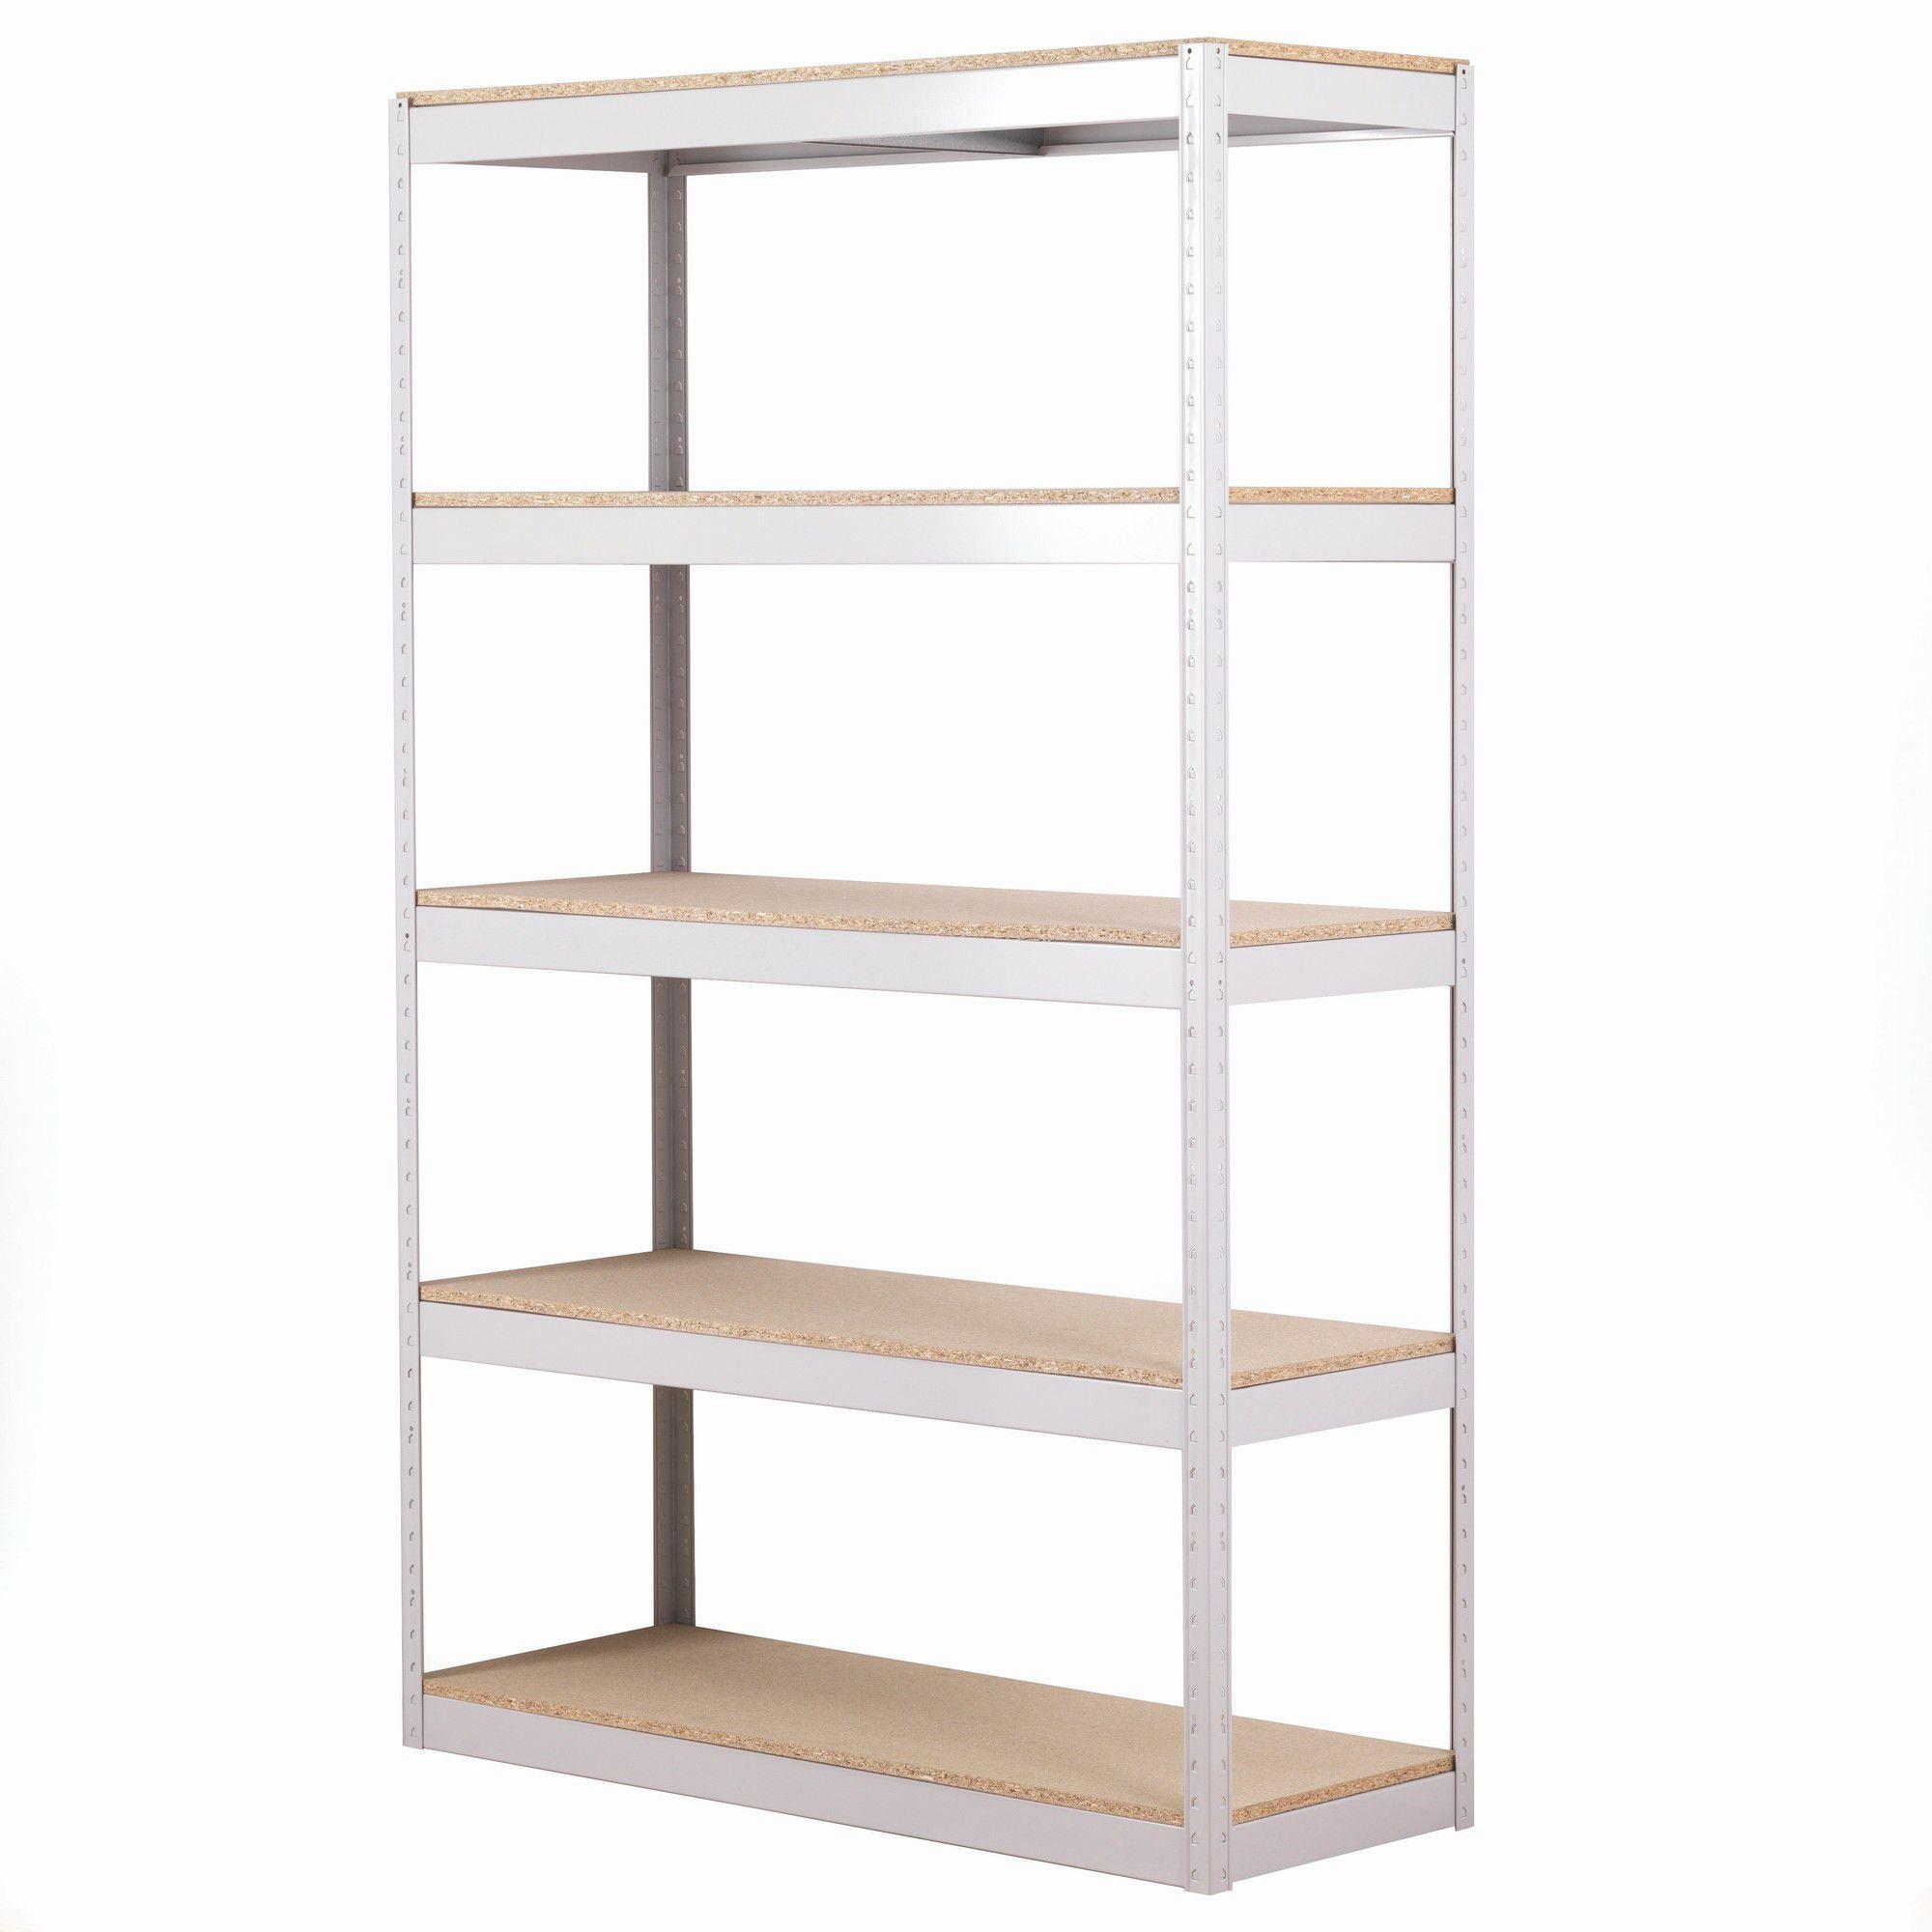 Office Sense Zamba Stock and Archive Tall Shelving Unit at Tescos Direct